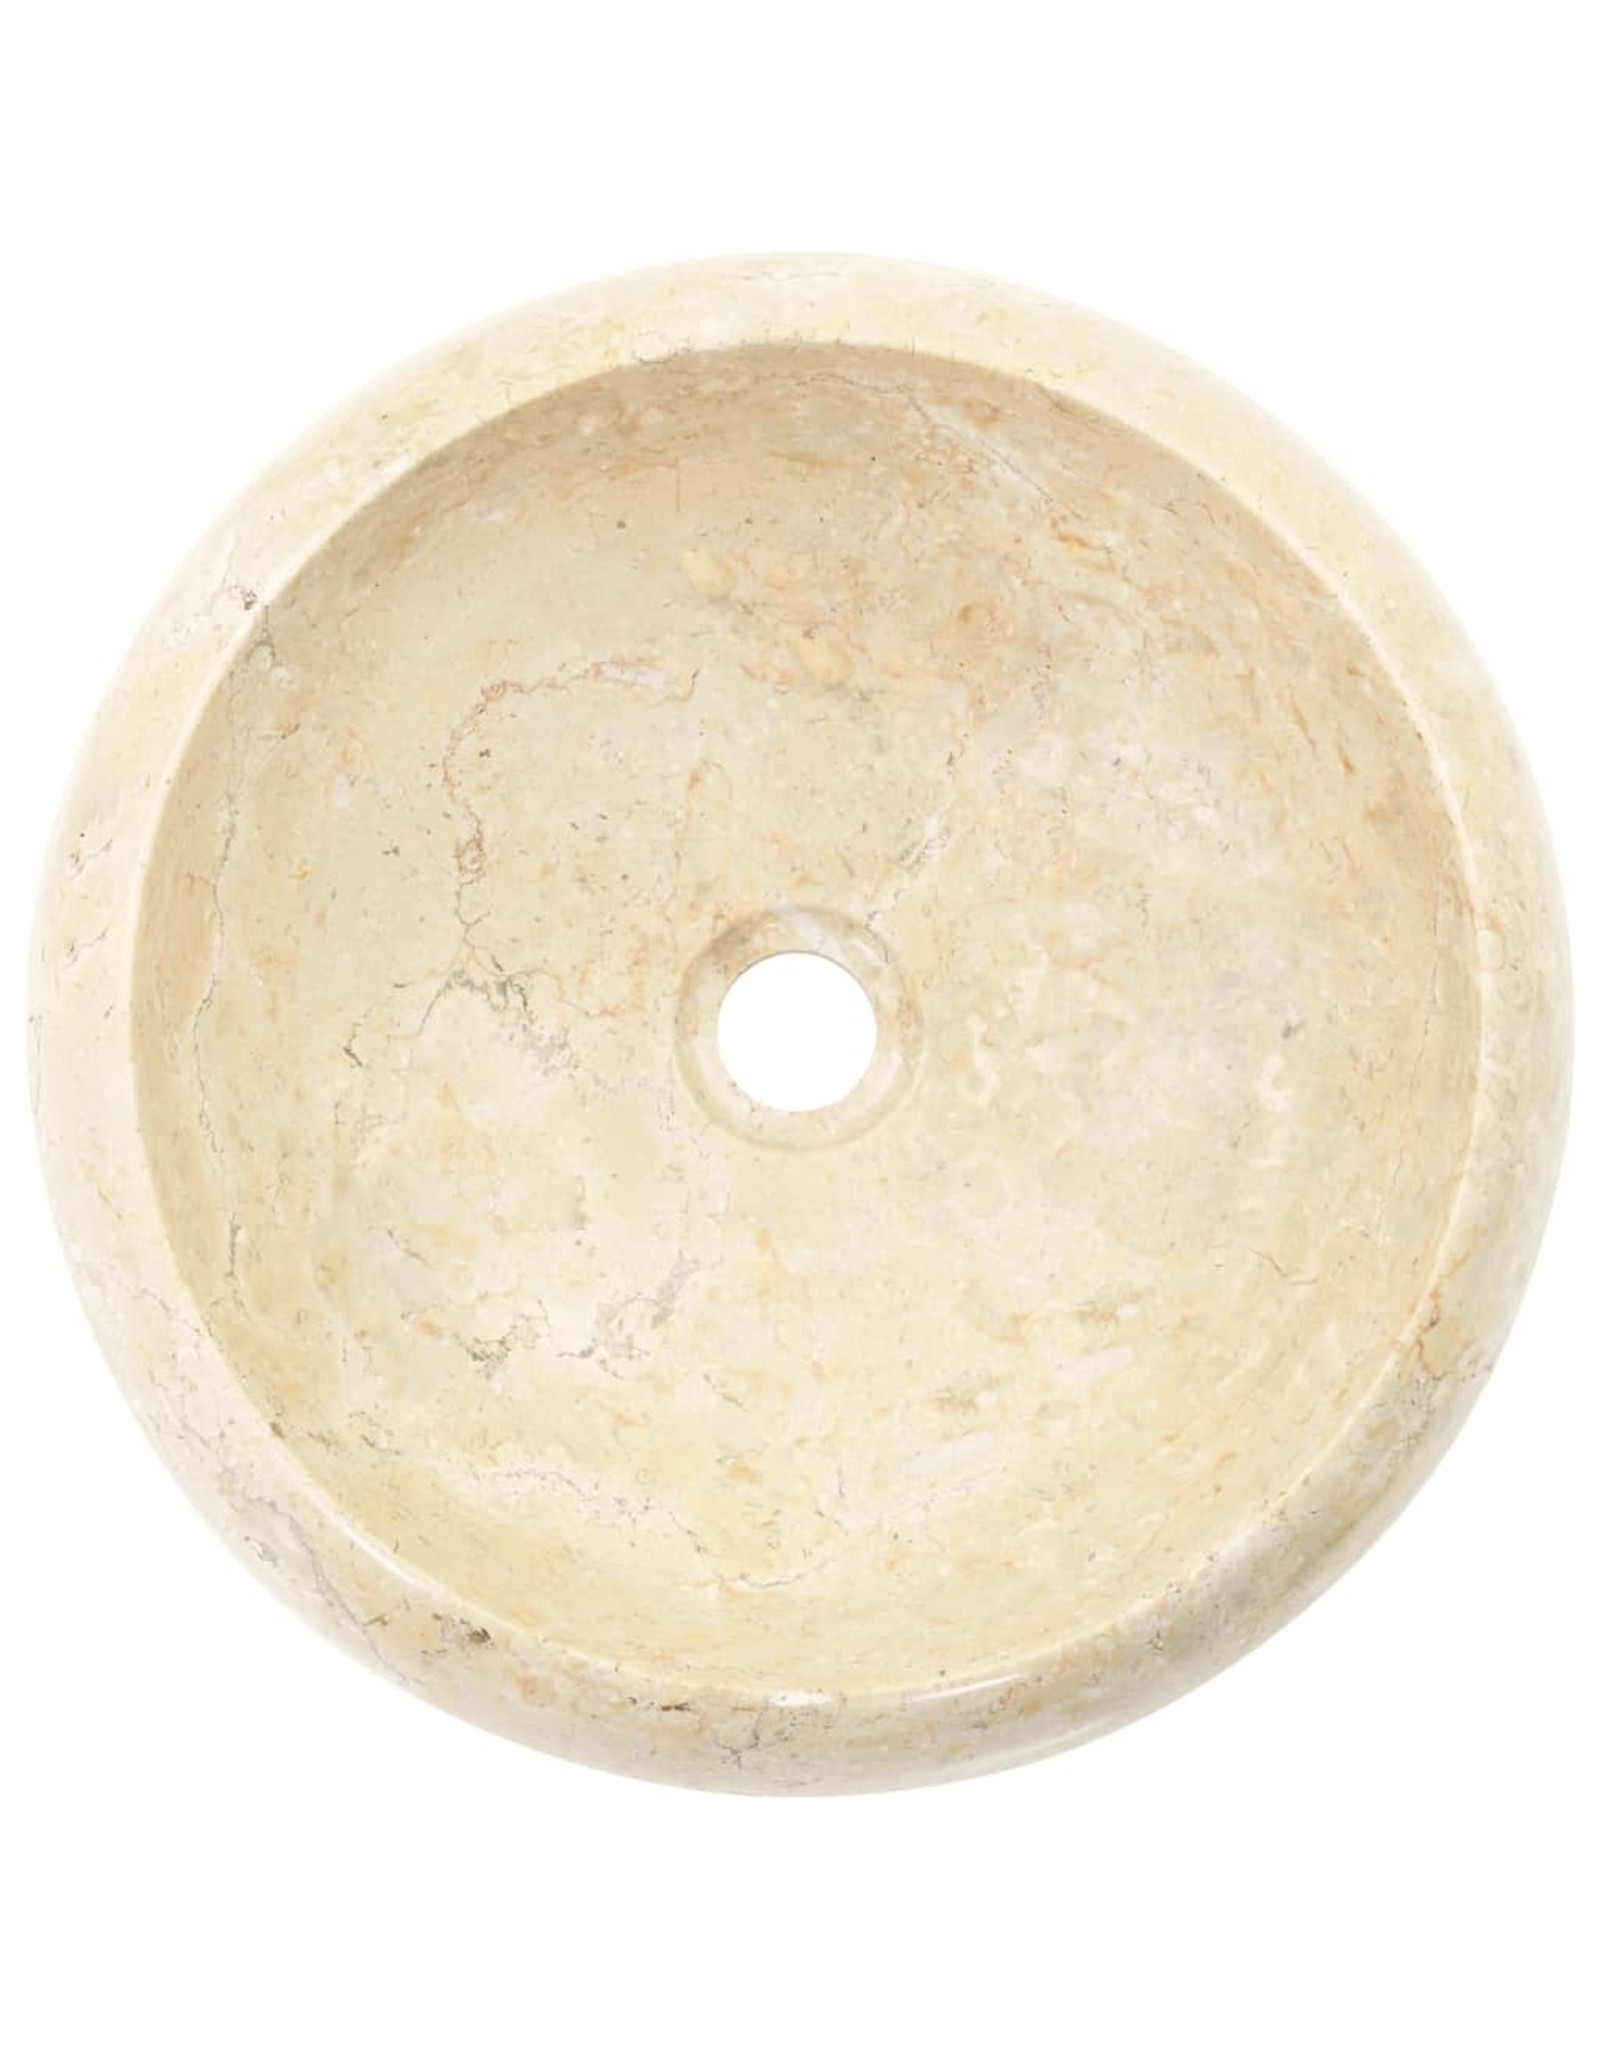 Gootsteen 40x12 cm marmer crème